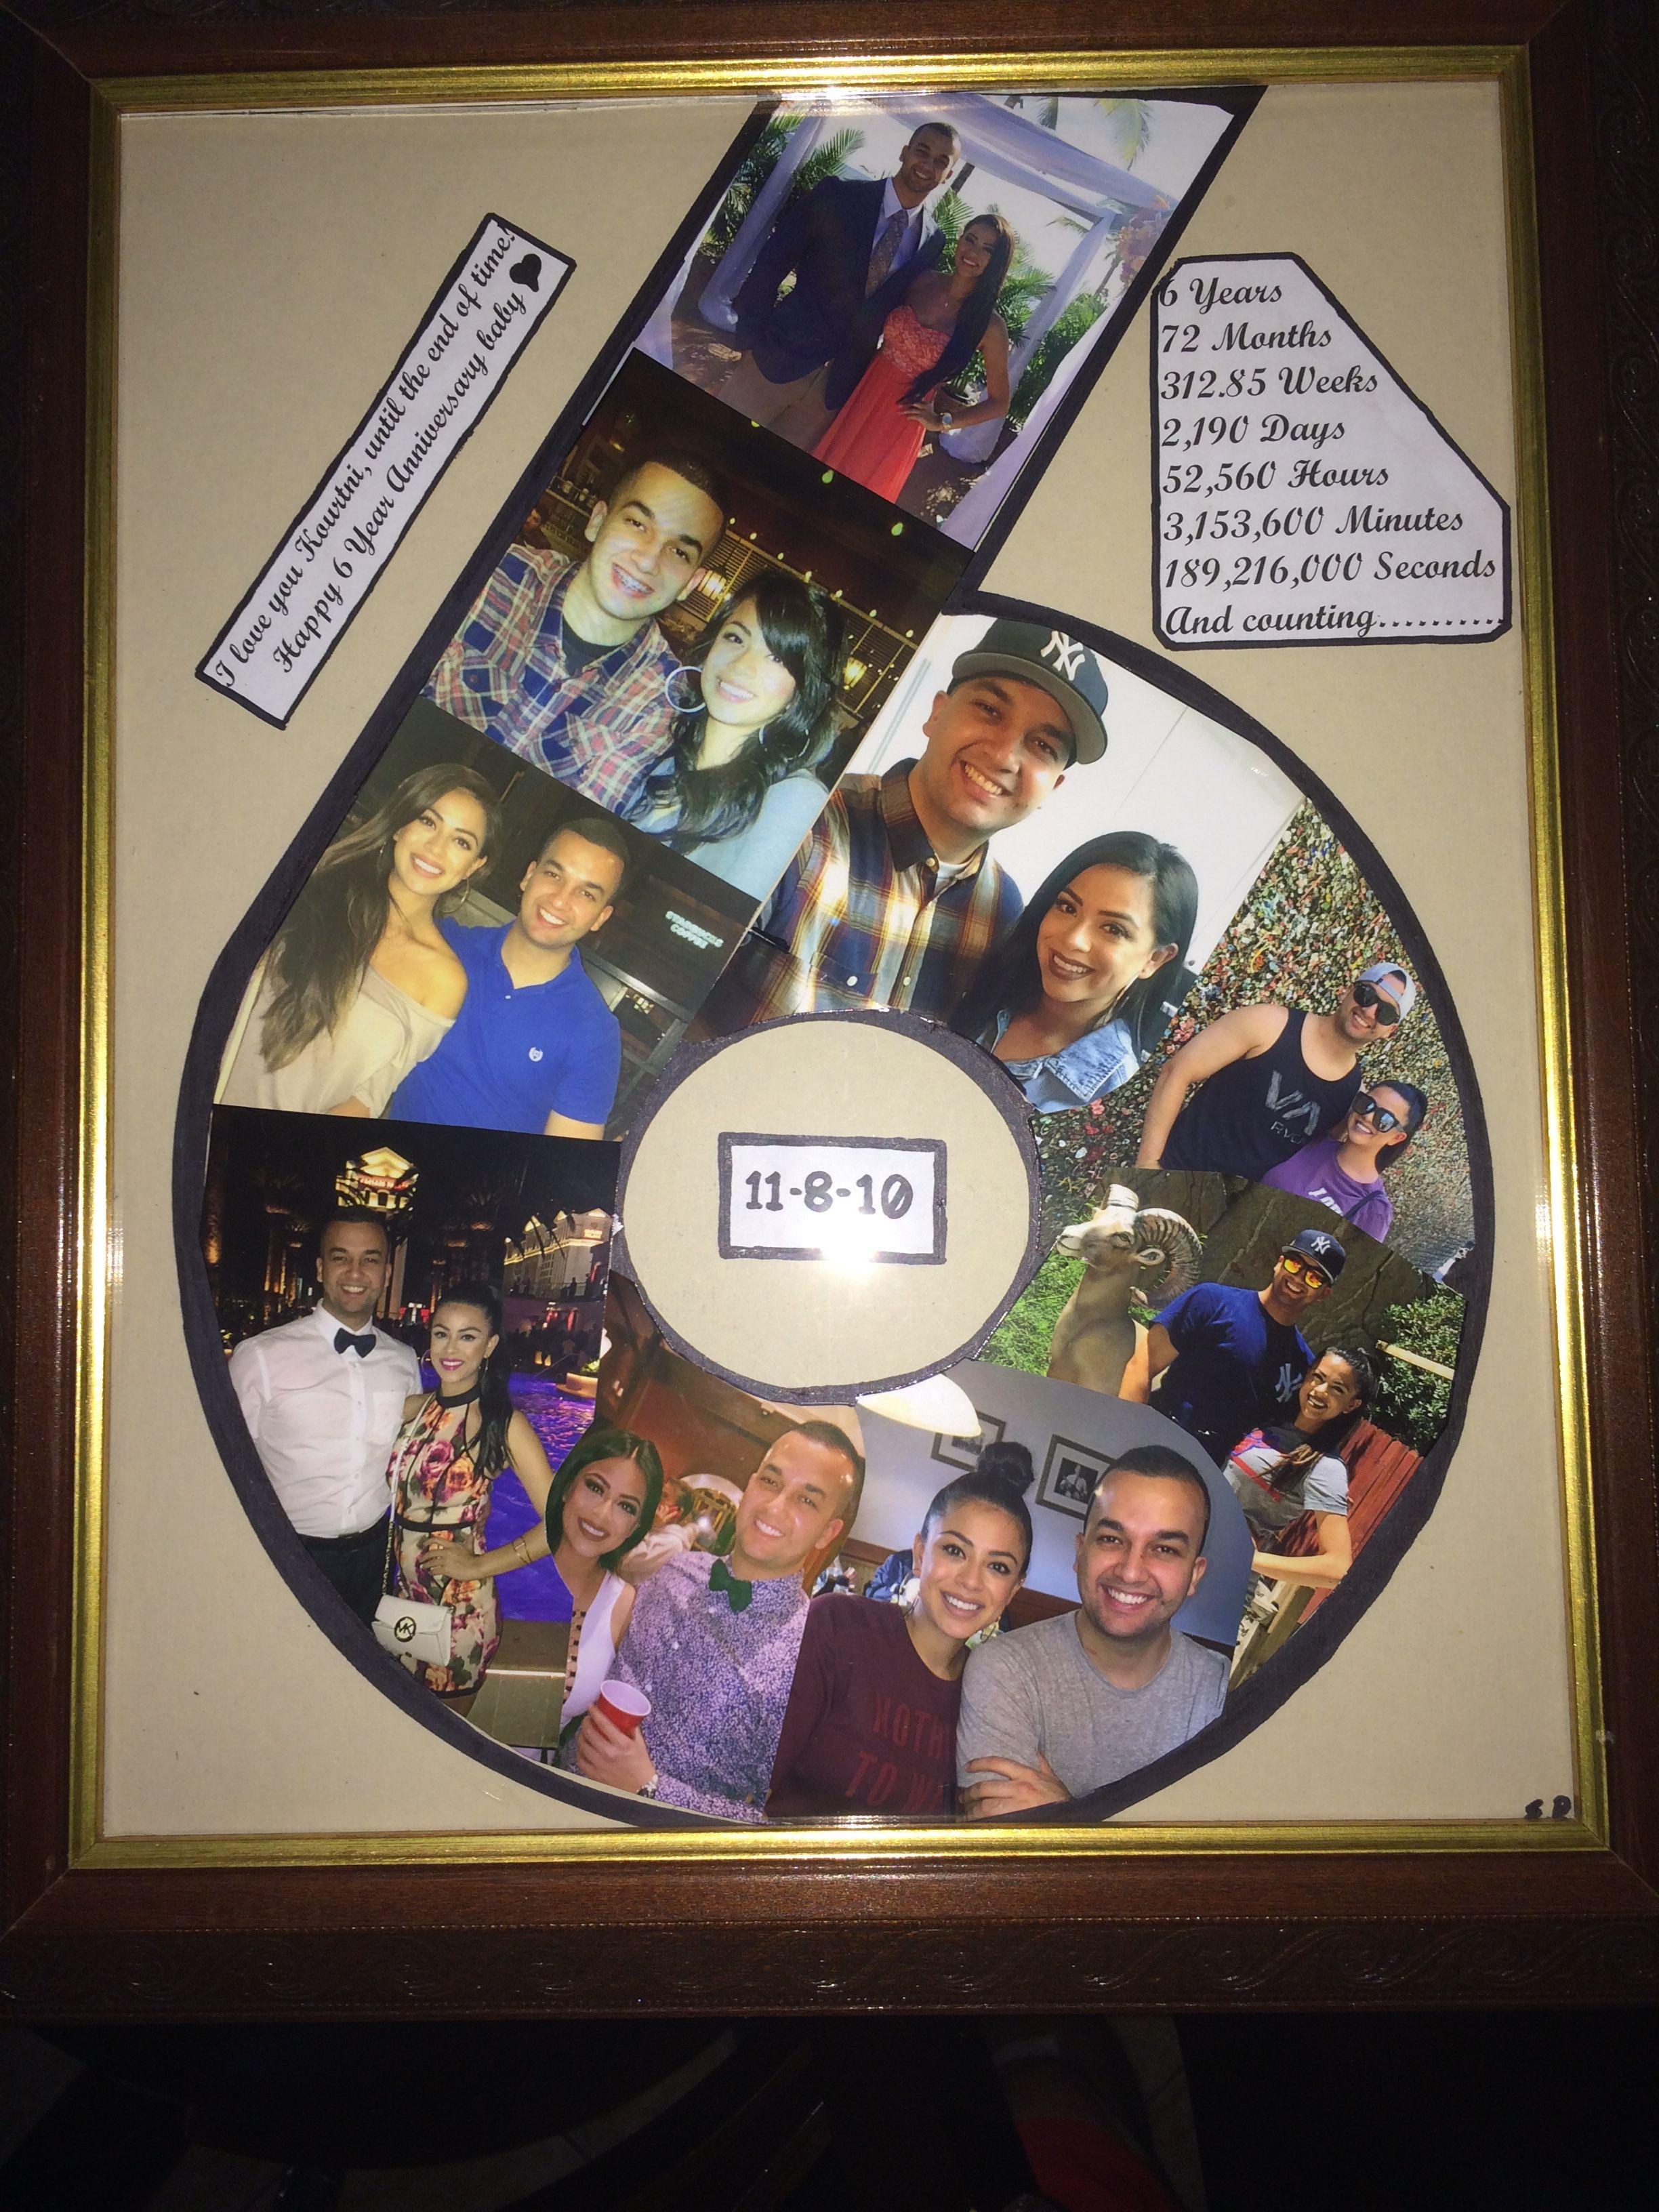 6 Year Anniversary Gift With Images Girlfriend Anniversary